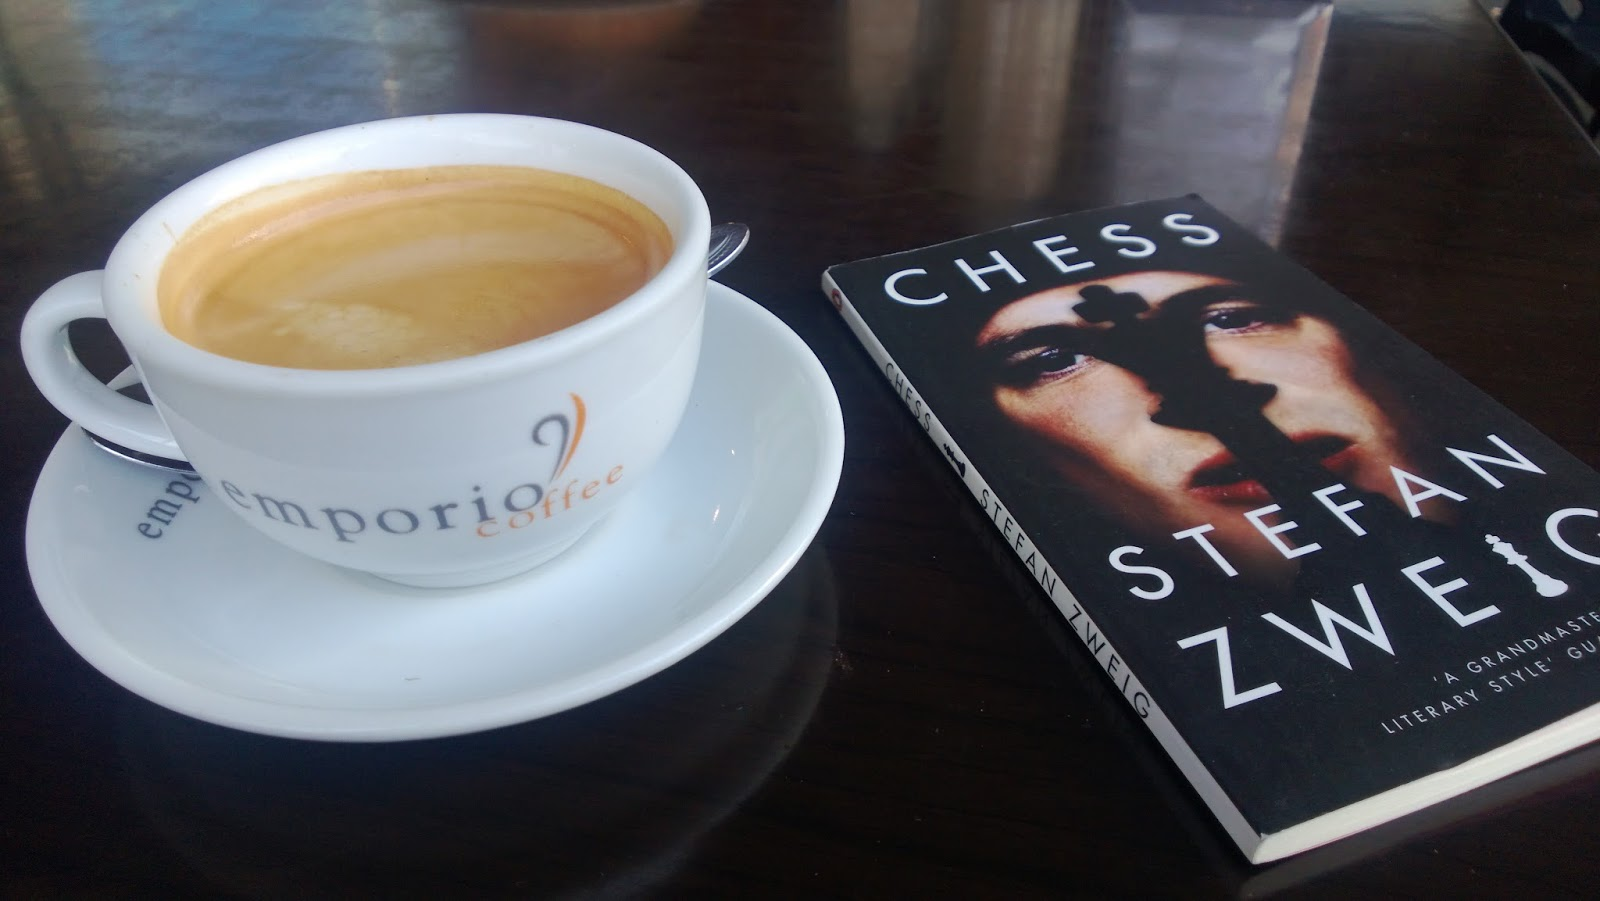 stefan zweig chess story pdf